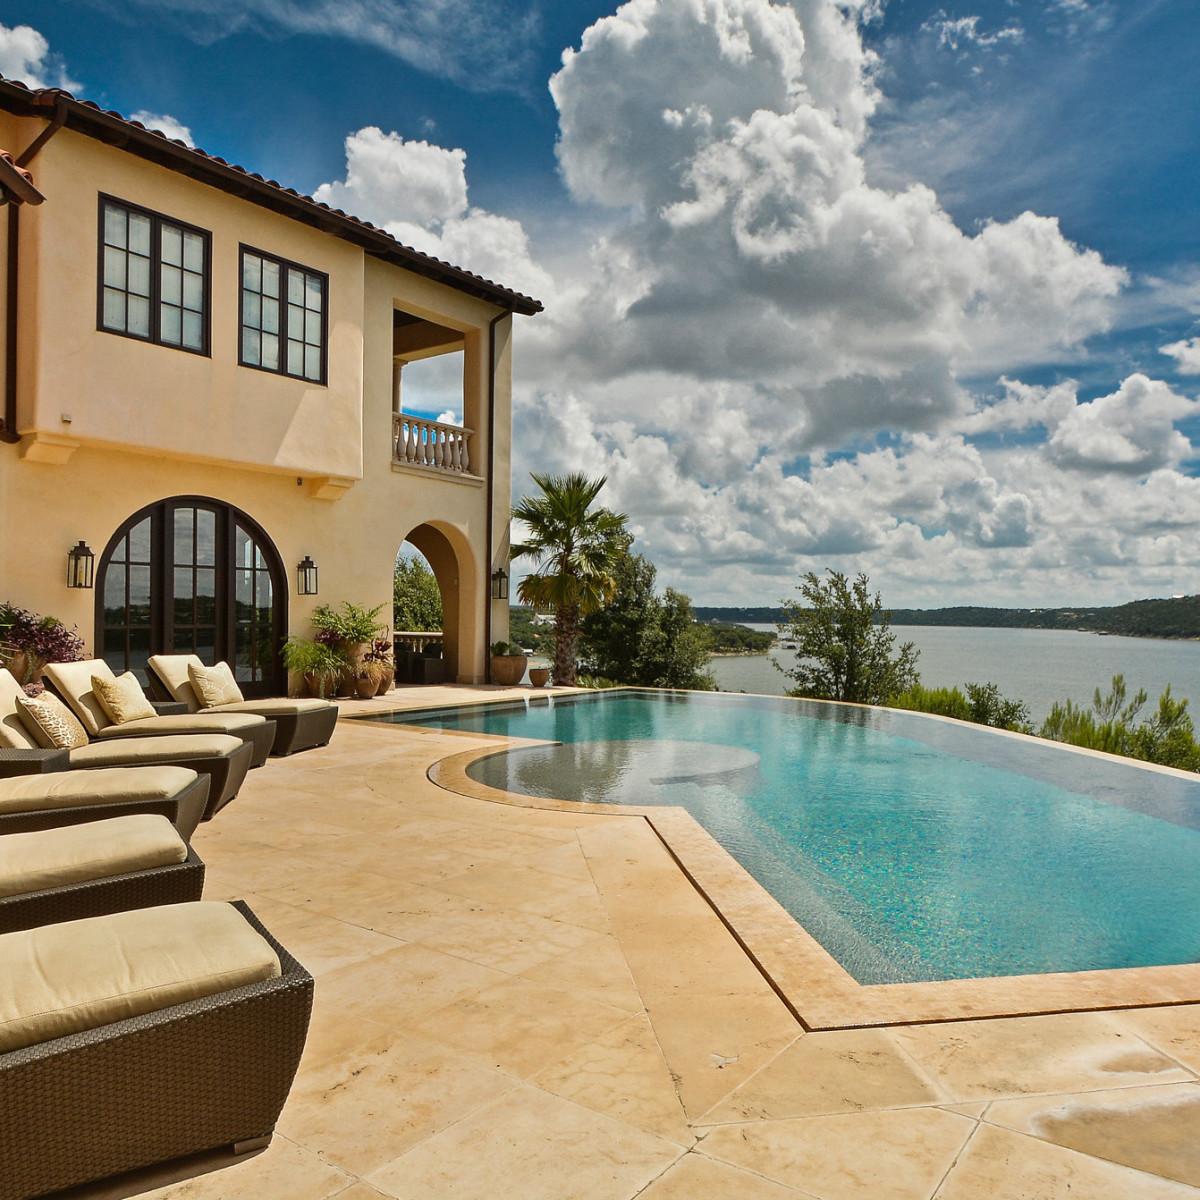 19700 La Isla Austin house for sale